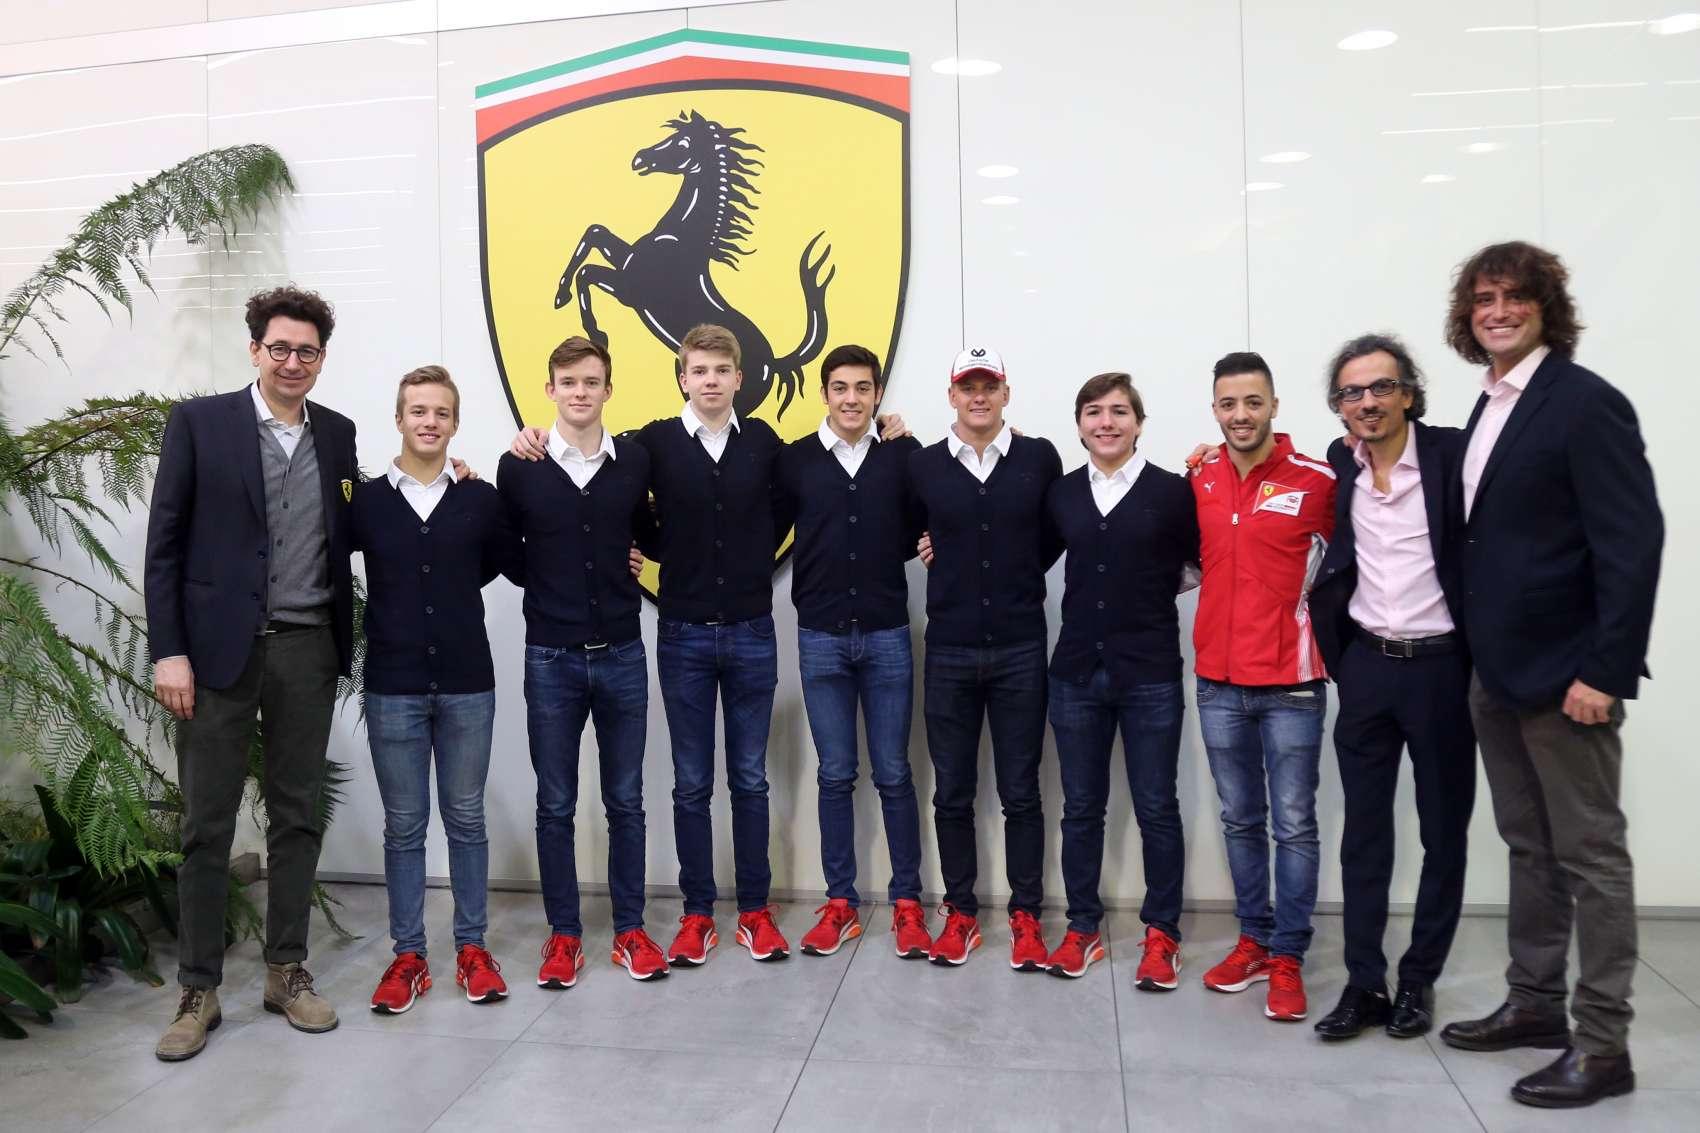 ferrari, mick schumacher, racingline, racinglinehu. racingline.hu